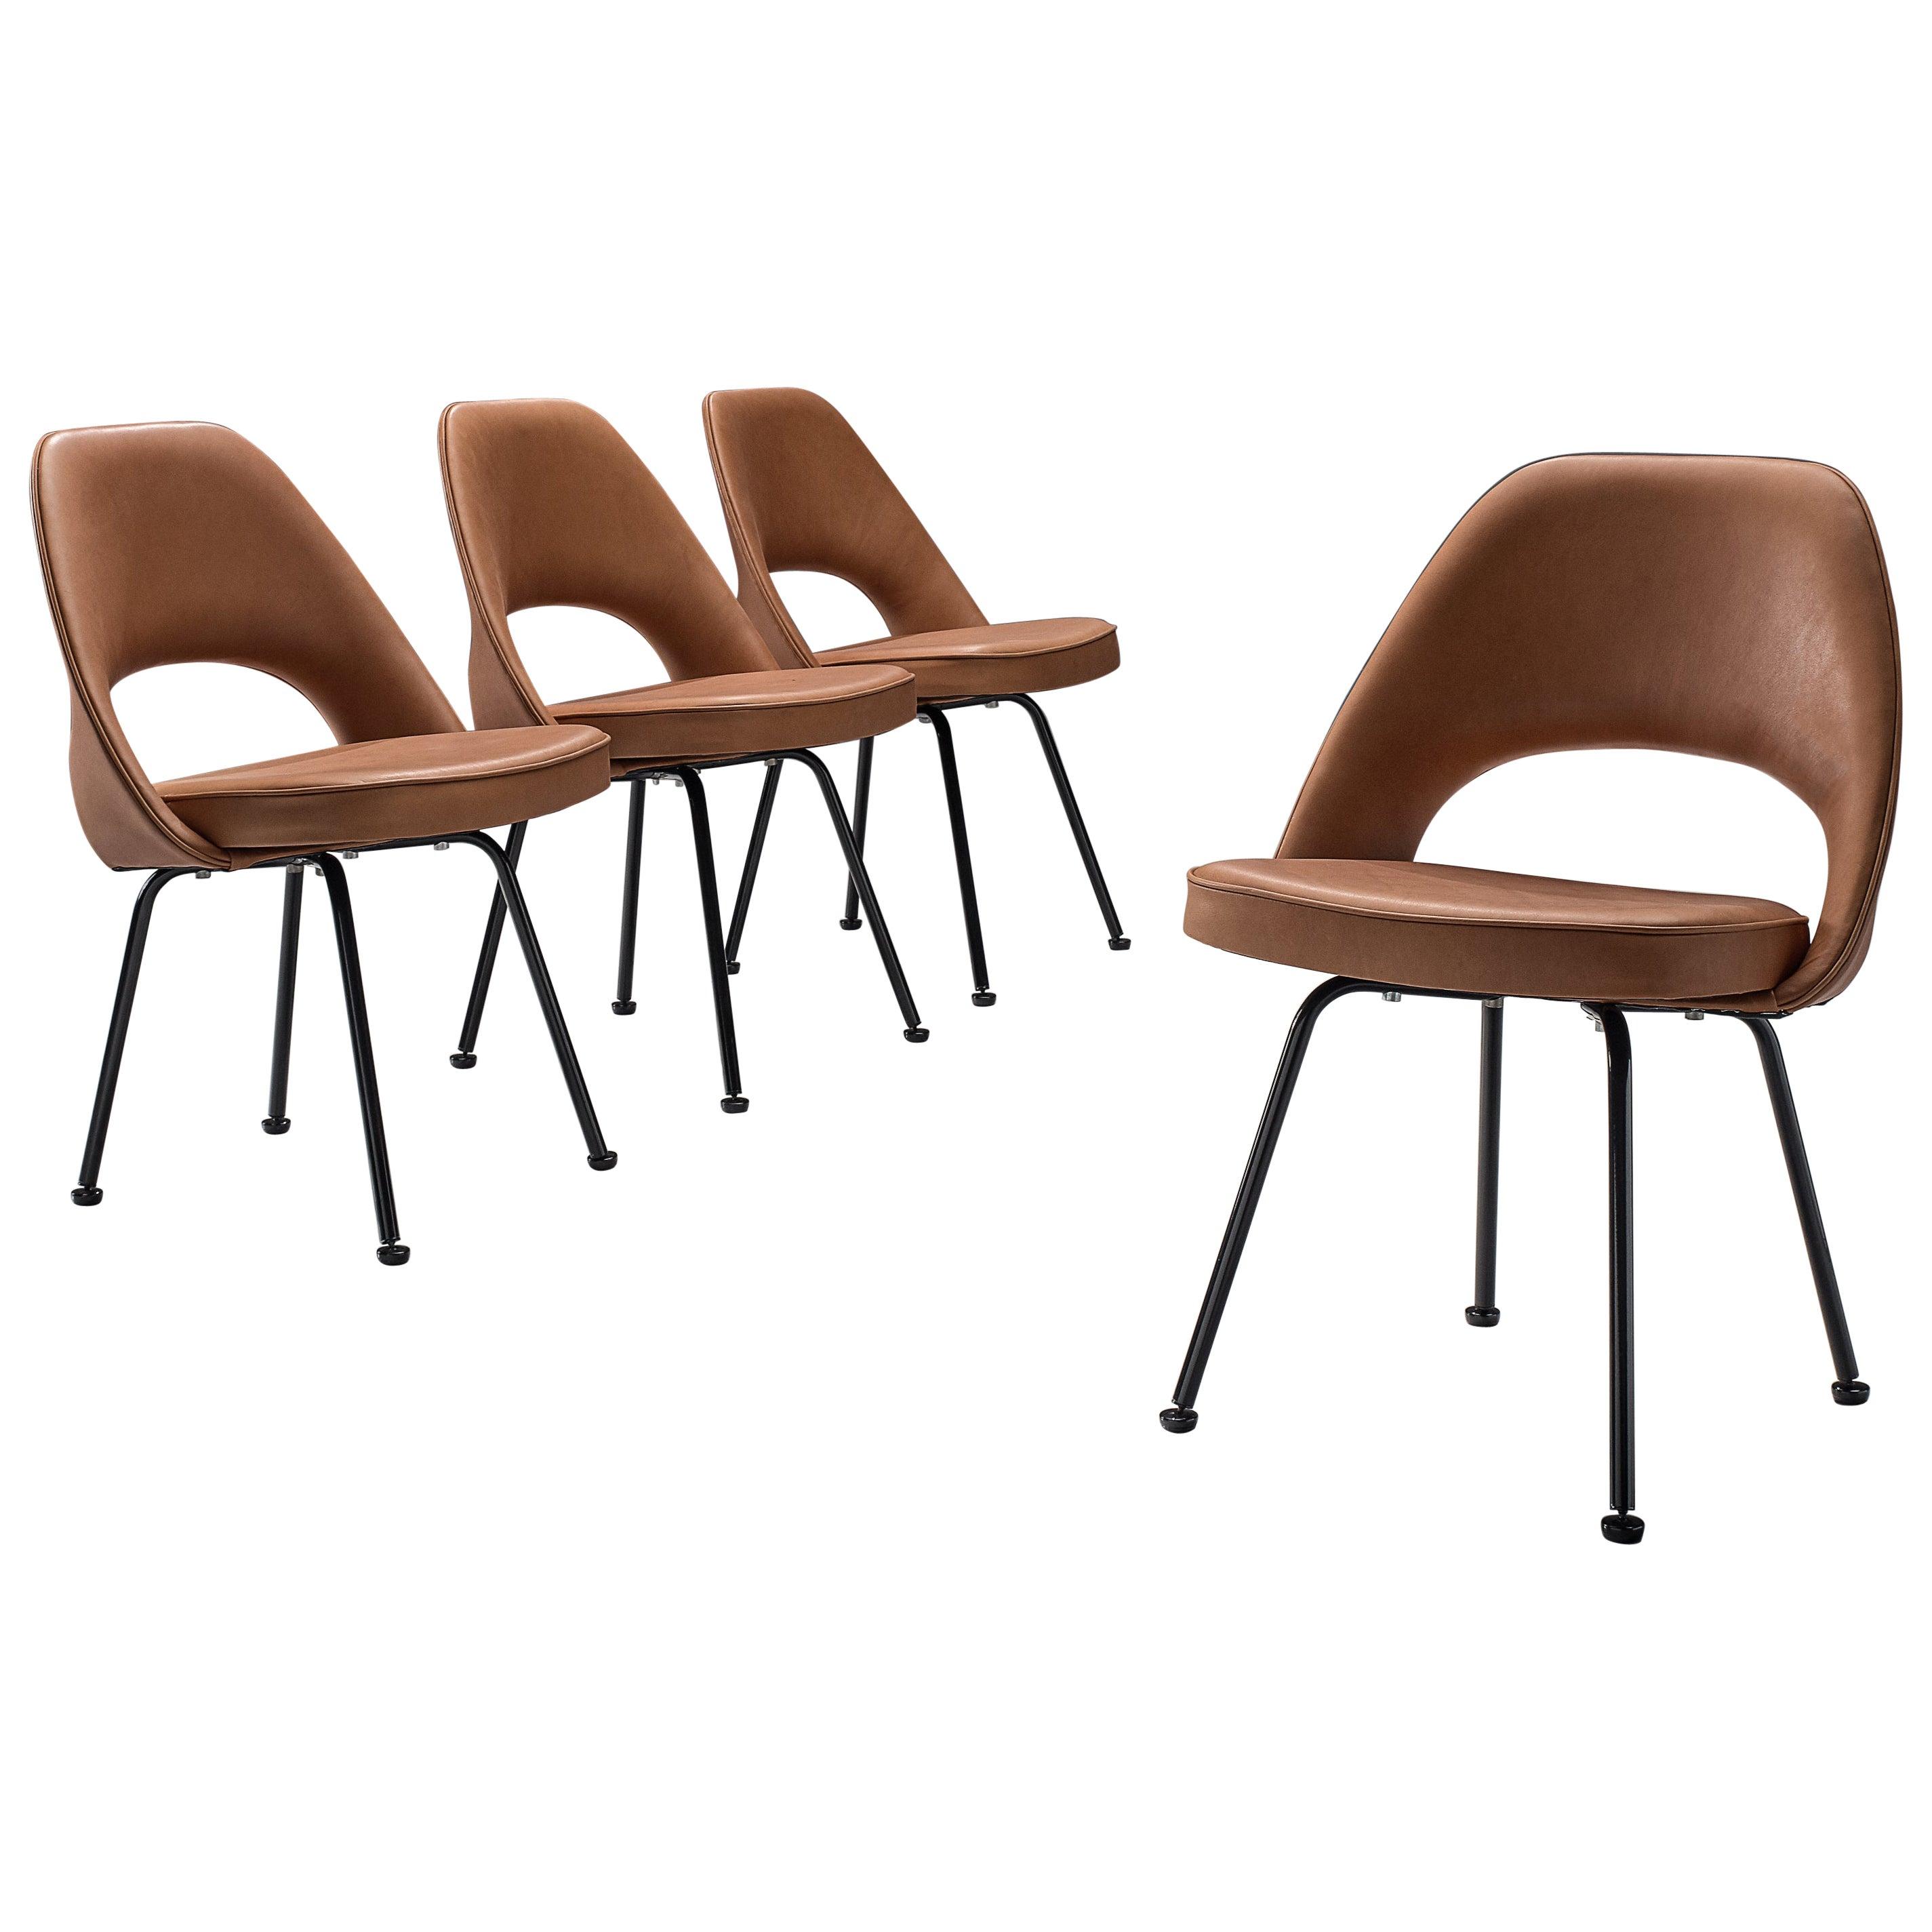 Eero Saarinen for Knoll International Dining Chairs in Brown Leather